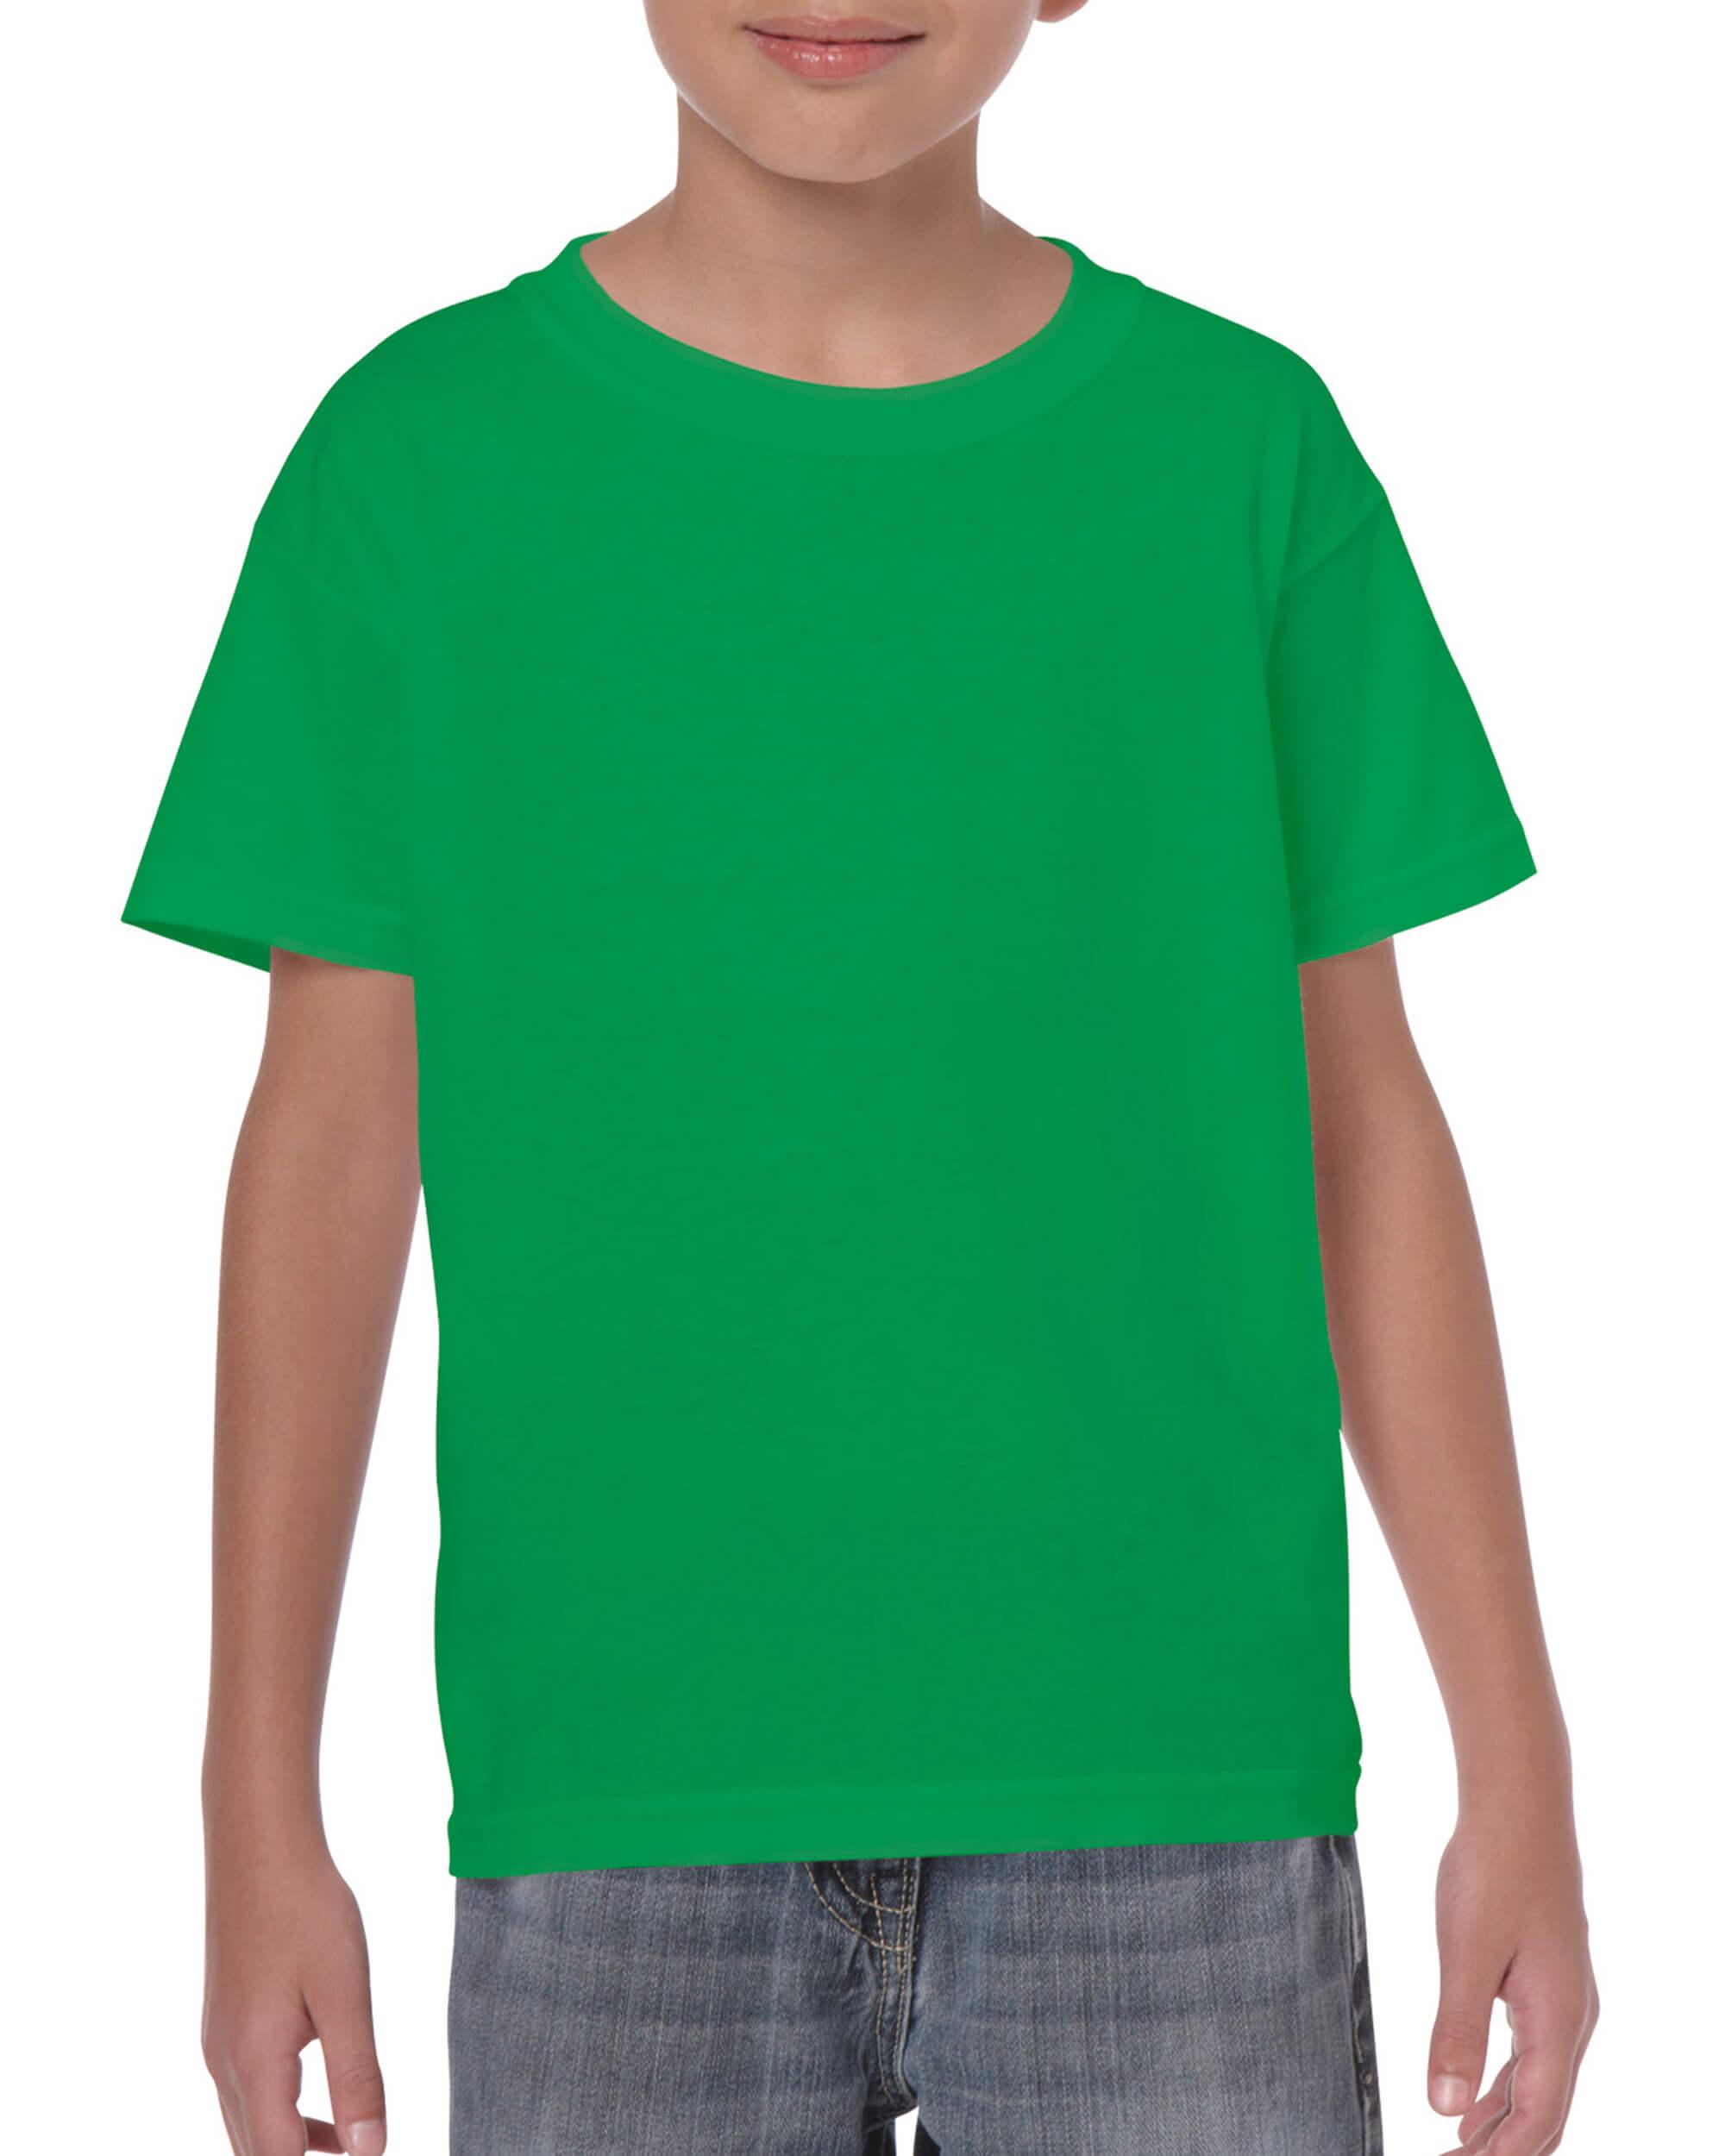 094eb5d3 Irish Green Kids T-shirt. $14.99. Customize Design